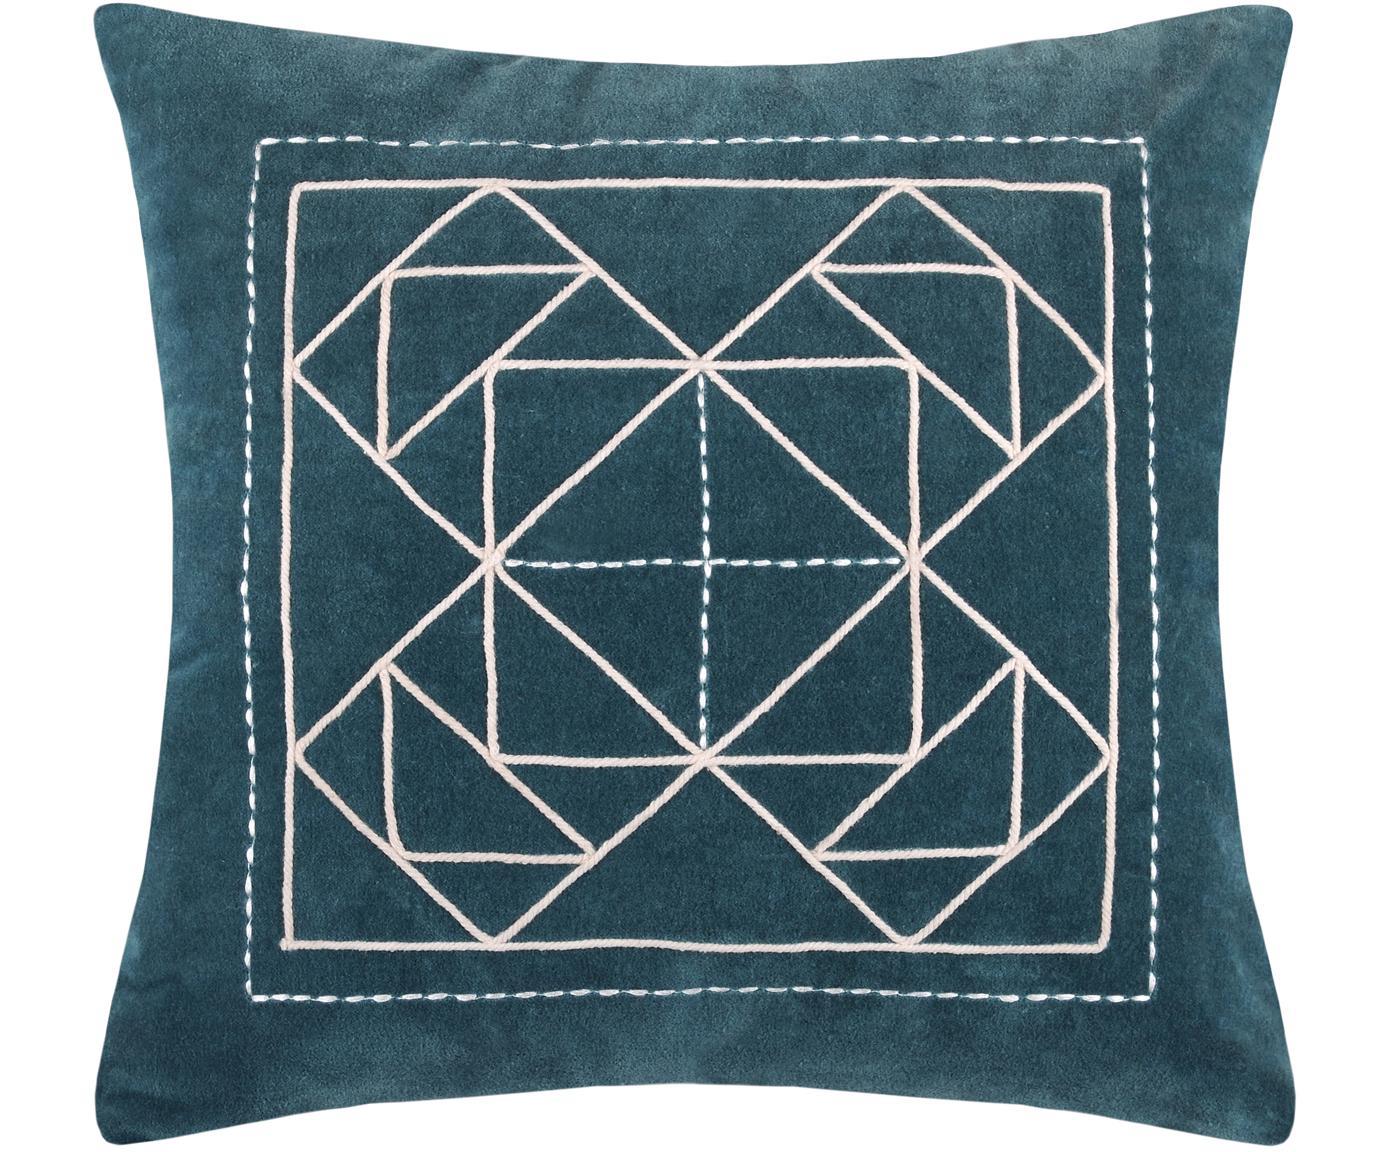 Cuscino con imbottitura Niro, Rivestimento: cotone, Blu petrolio, bianco, Larg. 40 x Lung. 40 cm